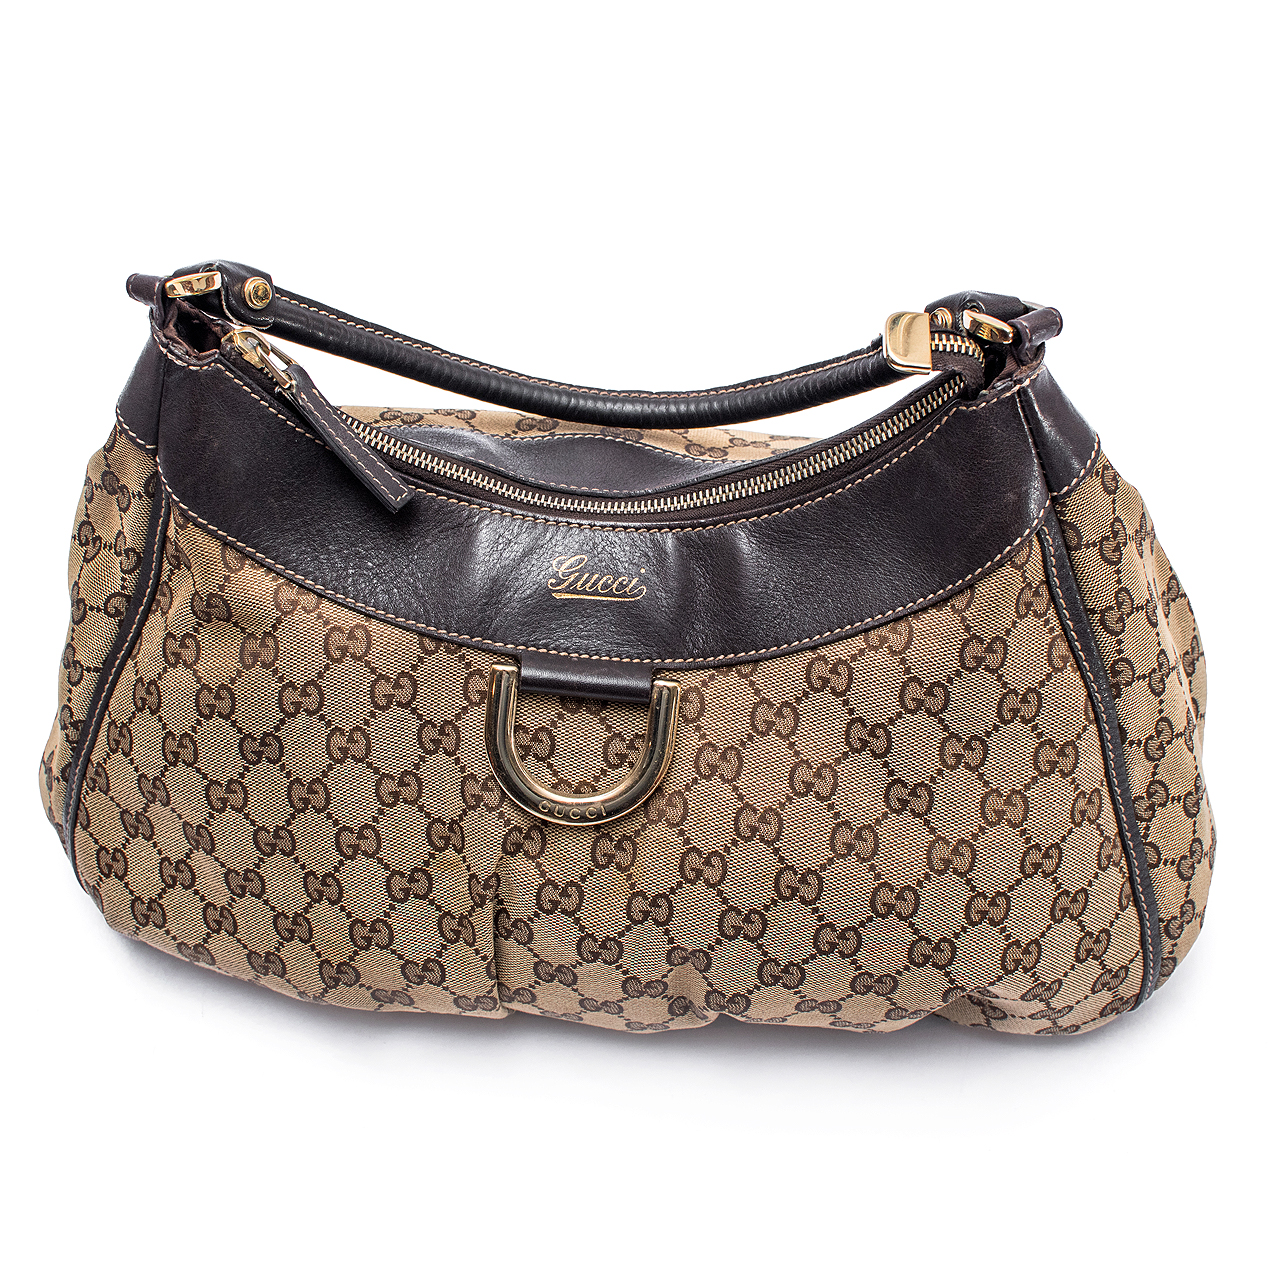 6a3d9631963 Bolsa Gucci Large D Hobo